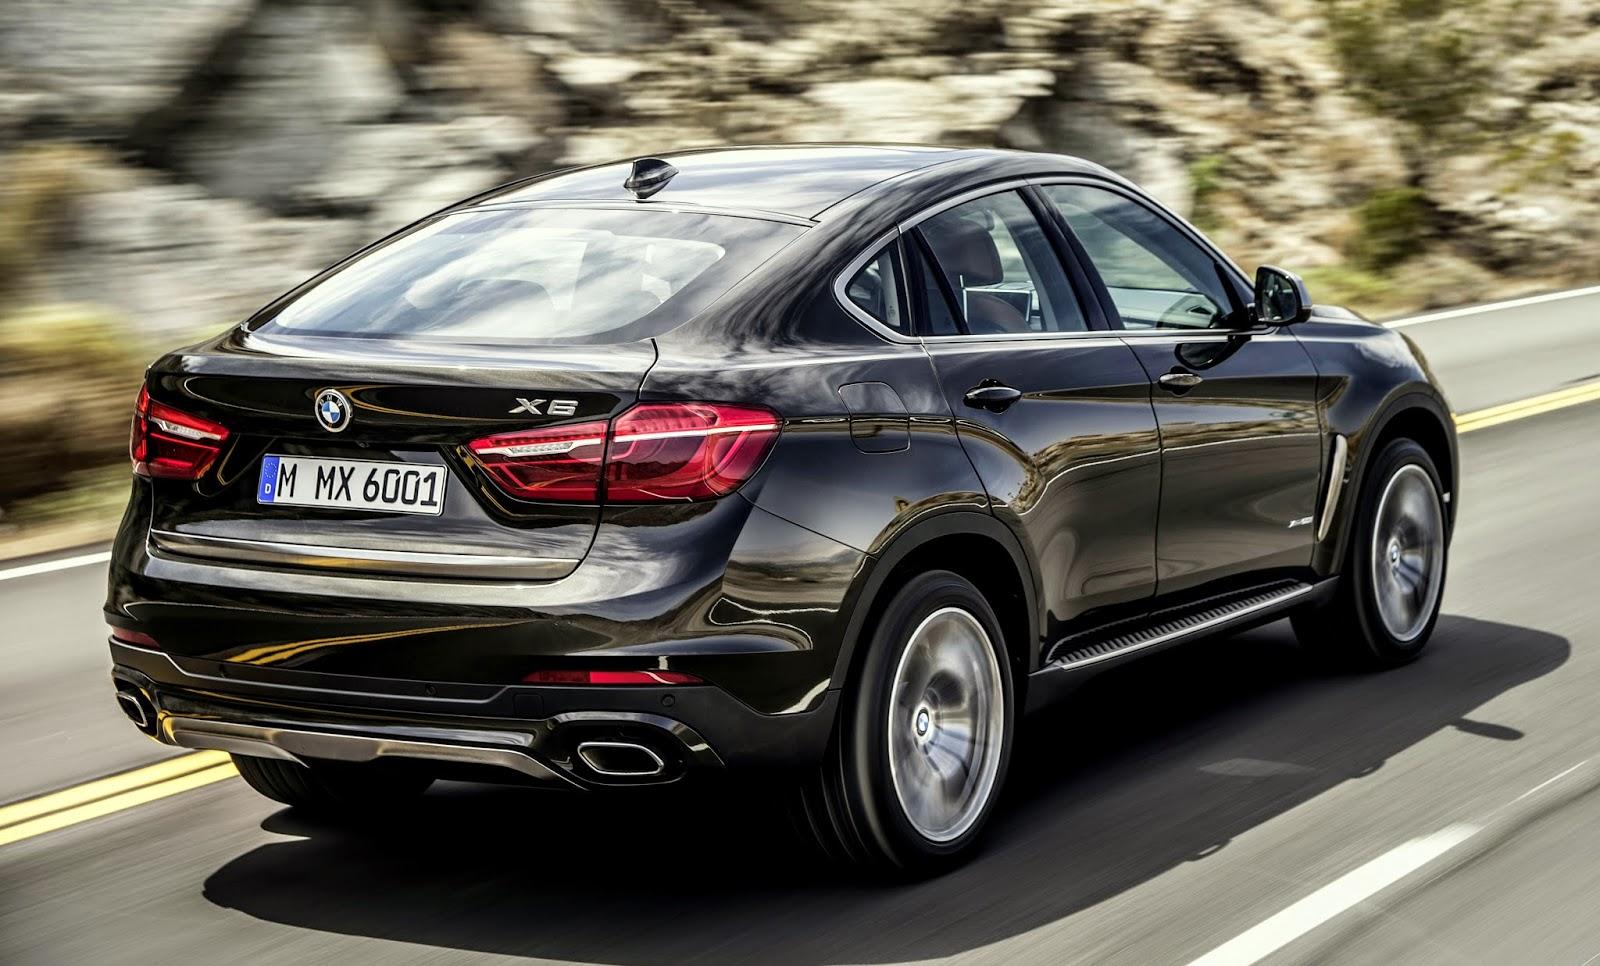 Worksheet. uautoknownet Allnew BMW X6 introduced  wvideo